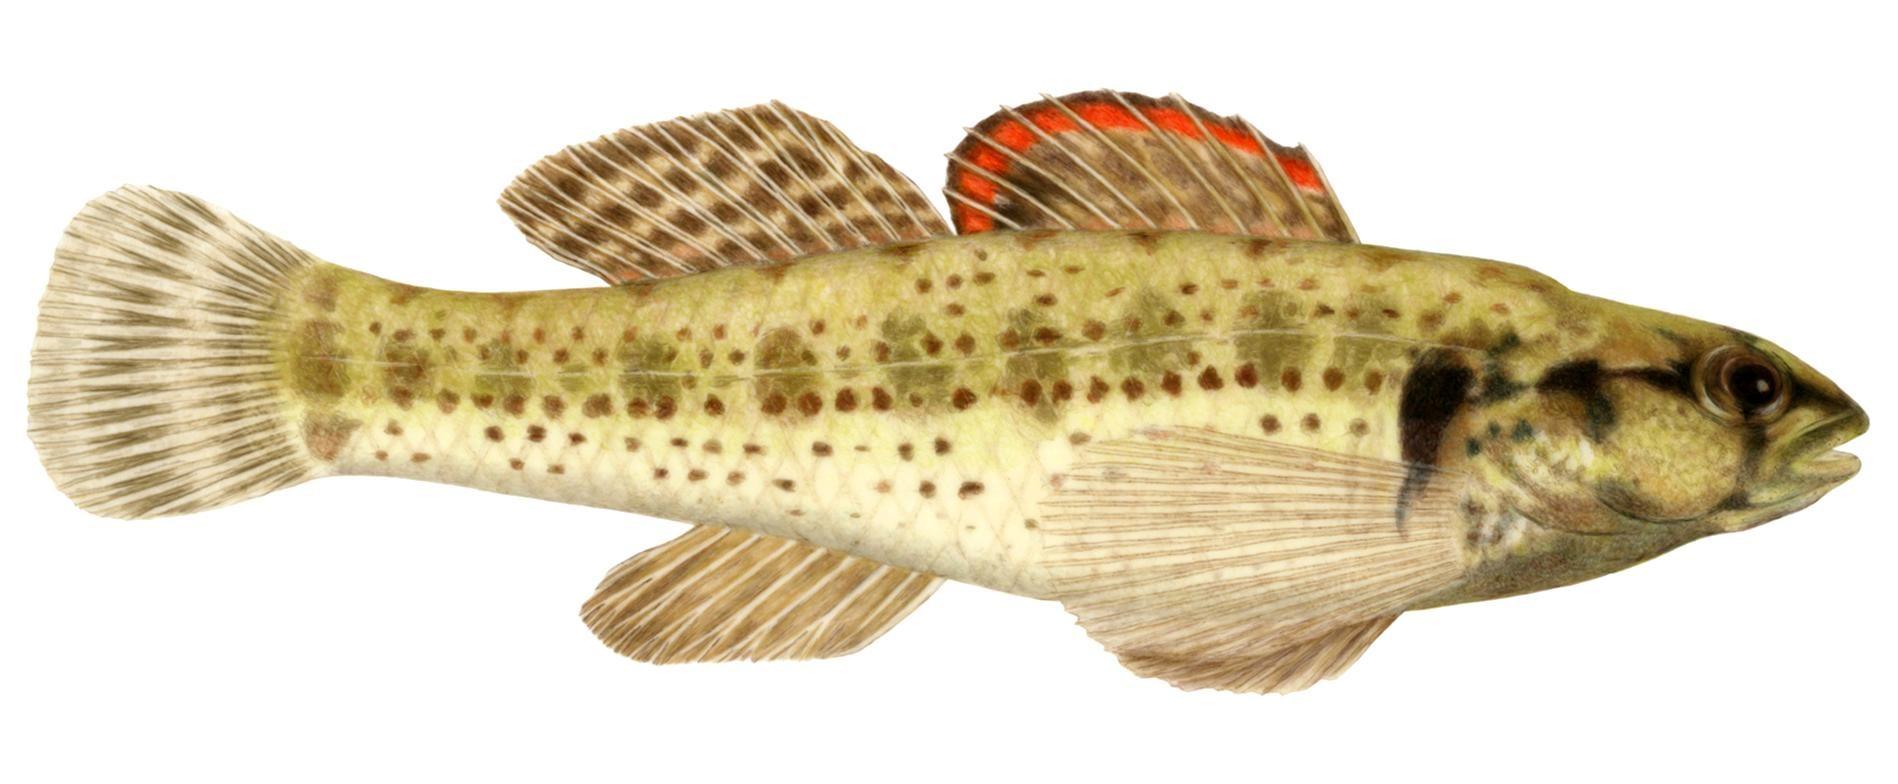 Free picture okaloosa darter illustration for Fish representative species